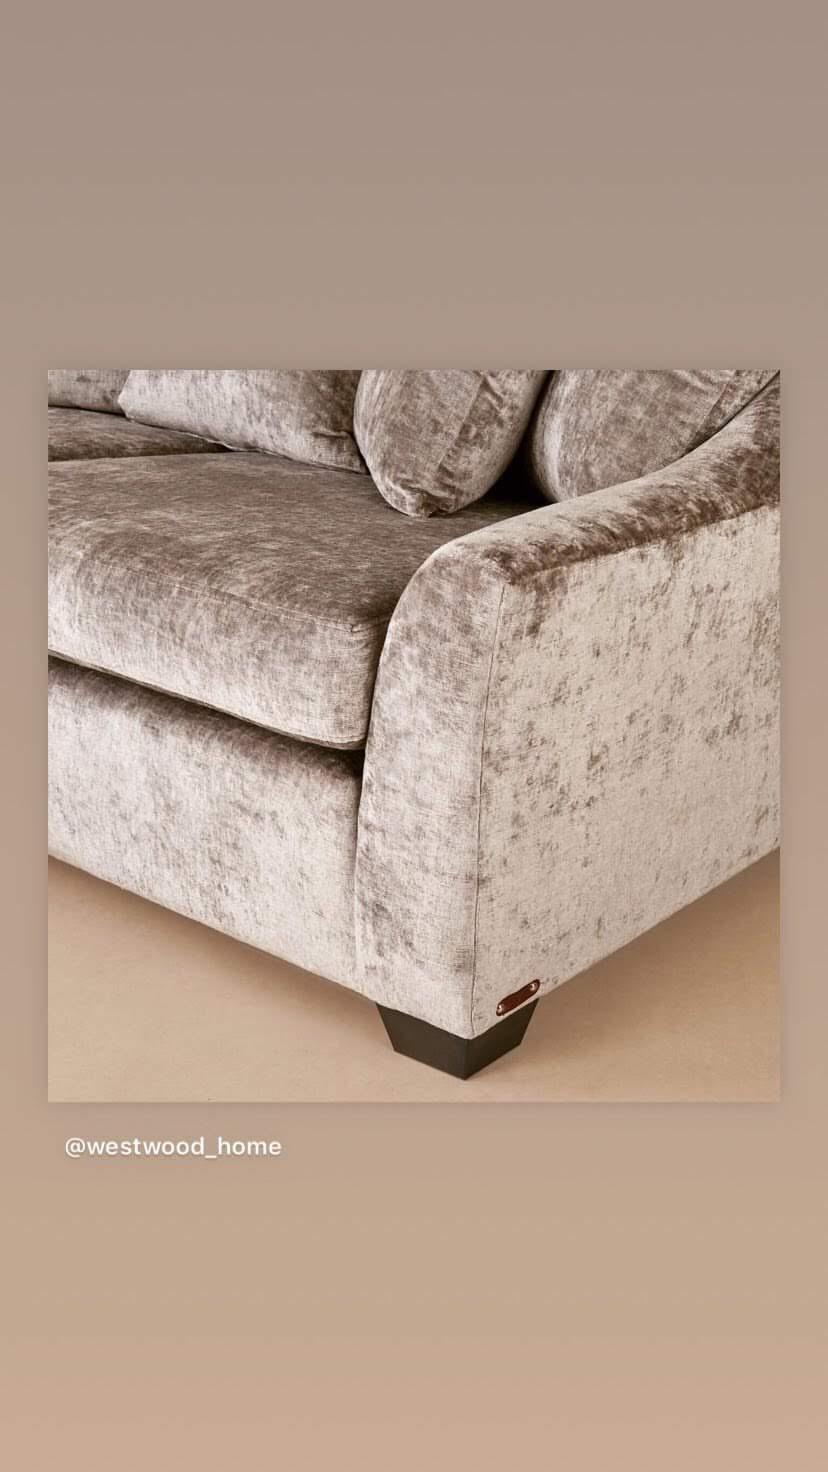 Bespoke sofas